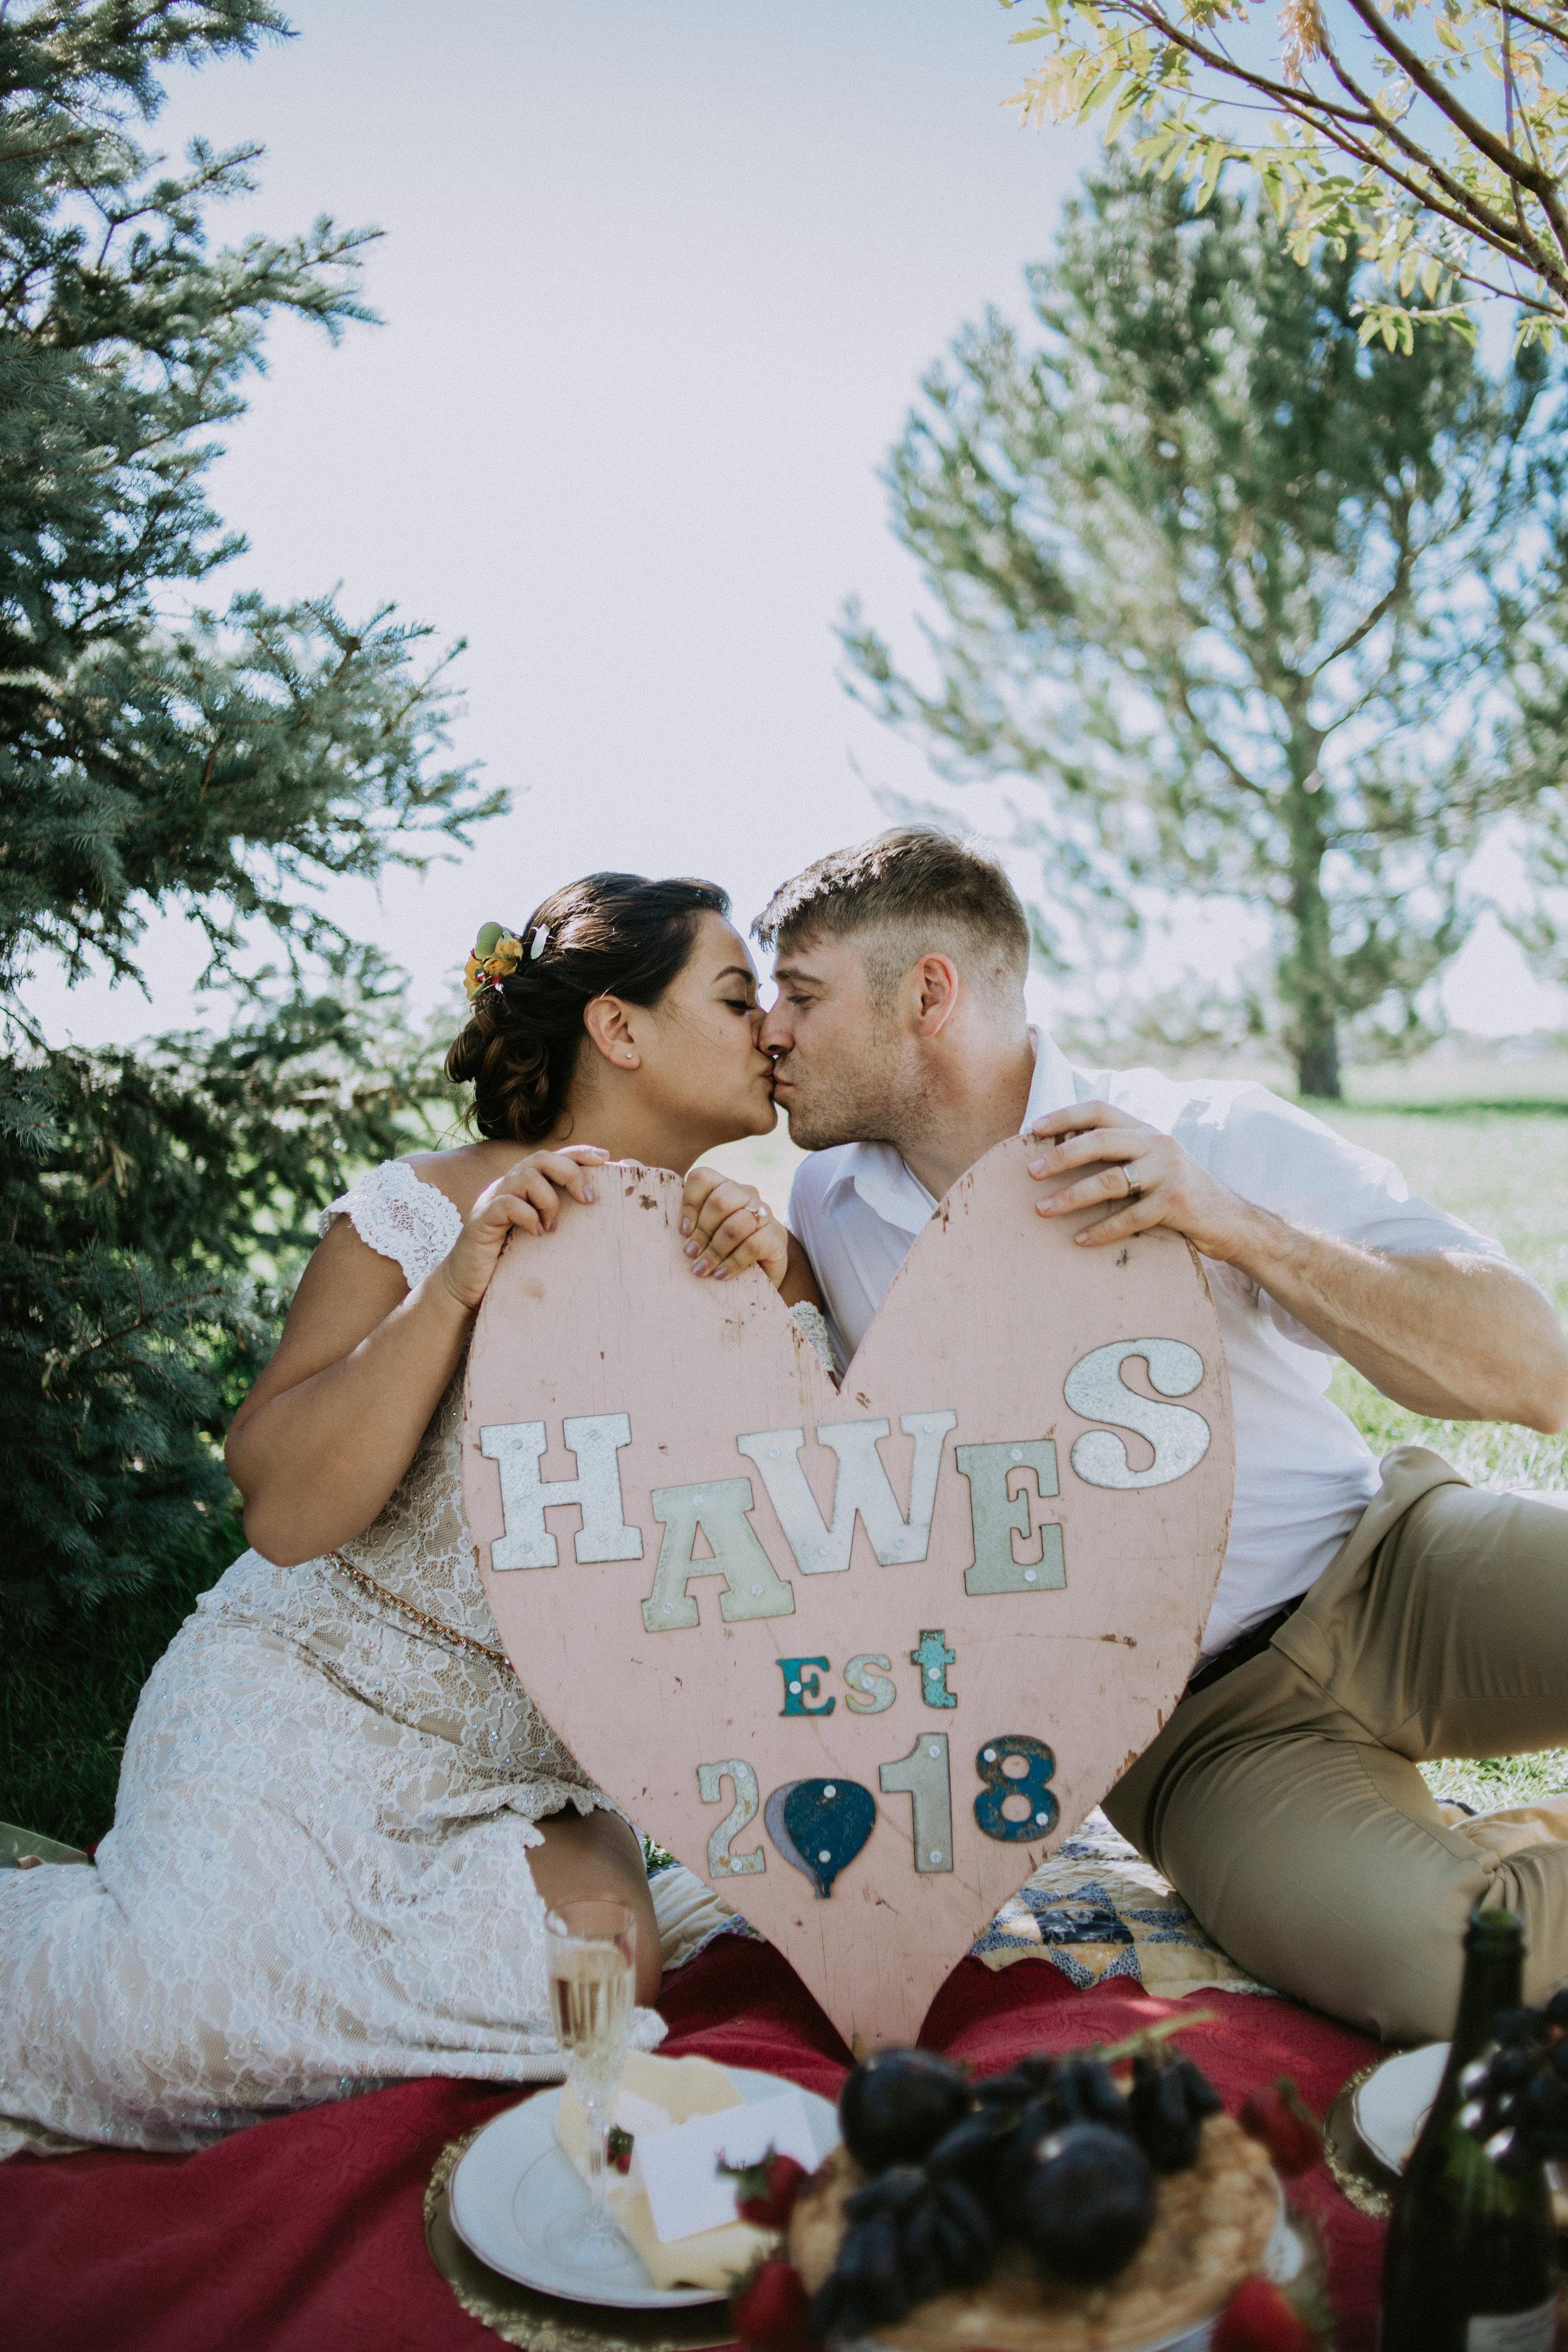 Blog — The Wedding Girls